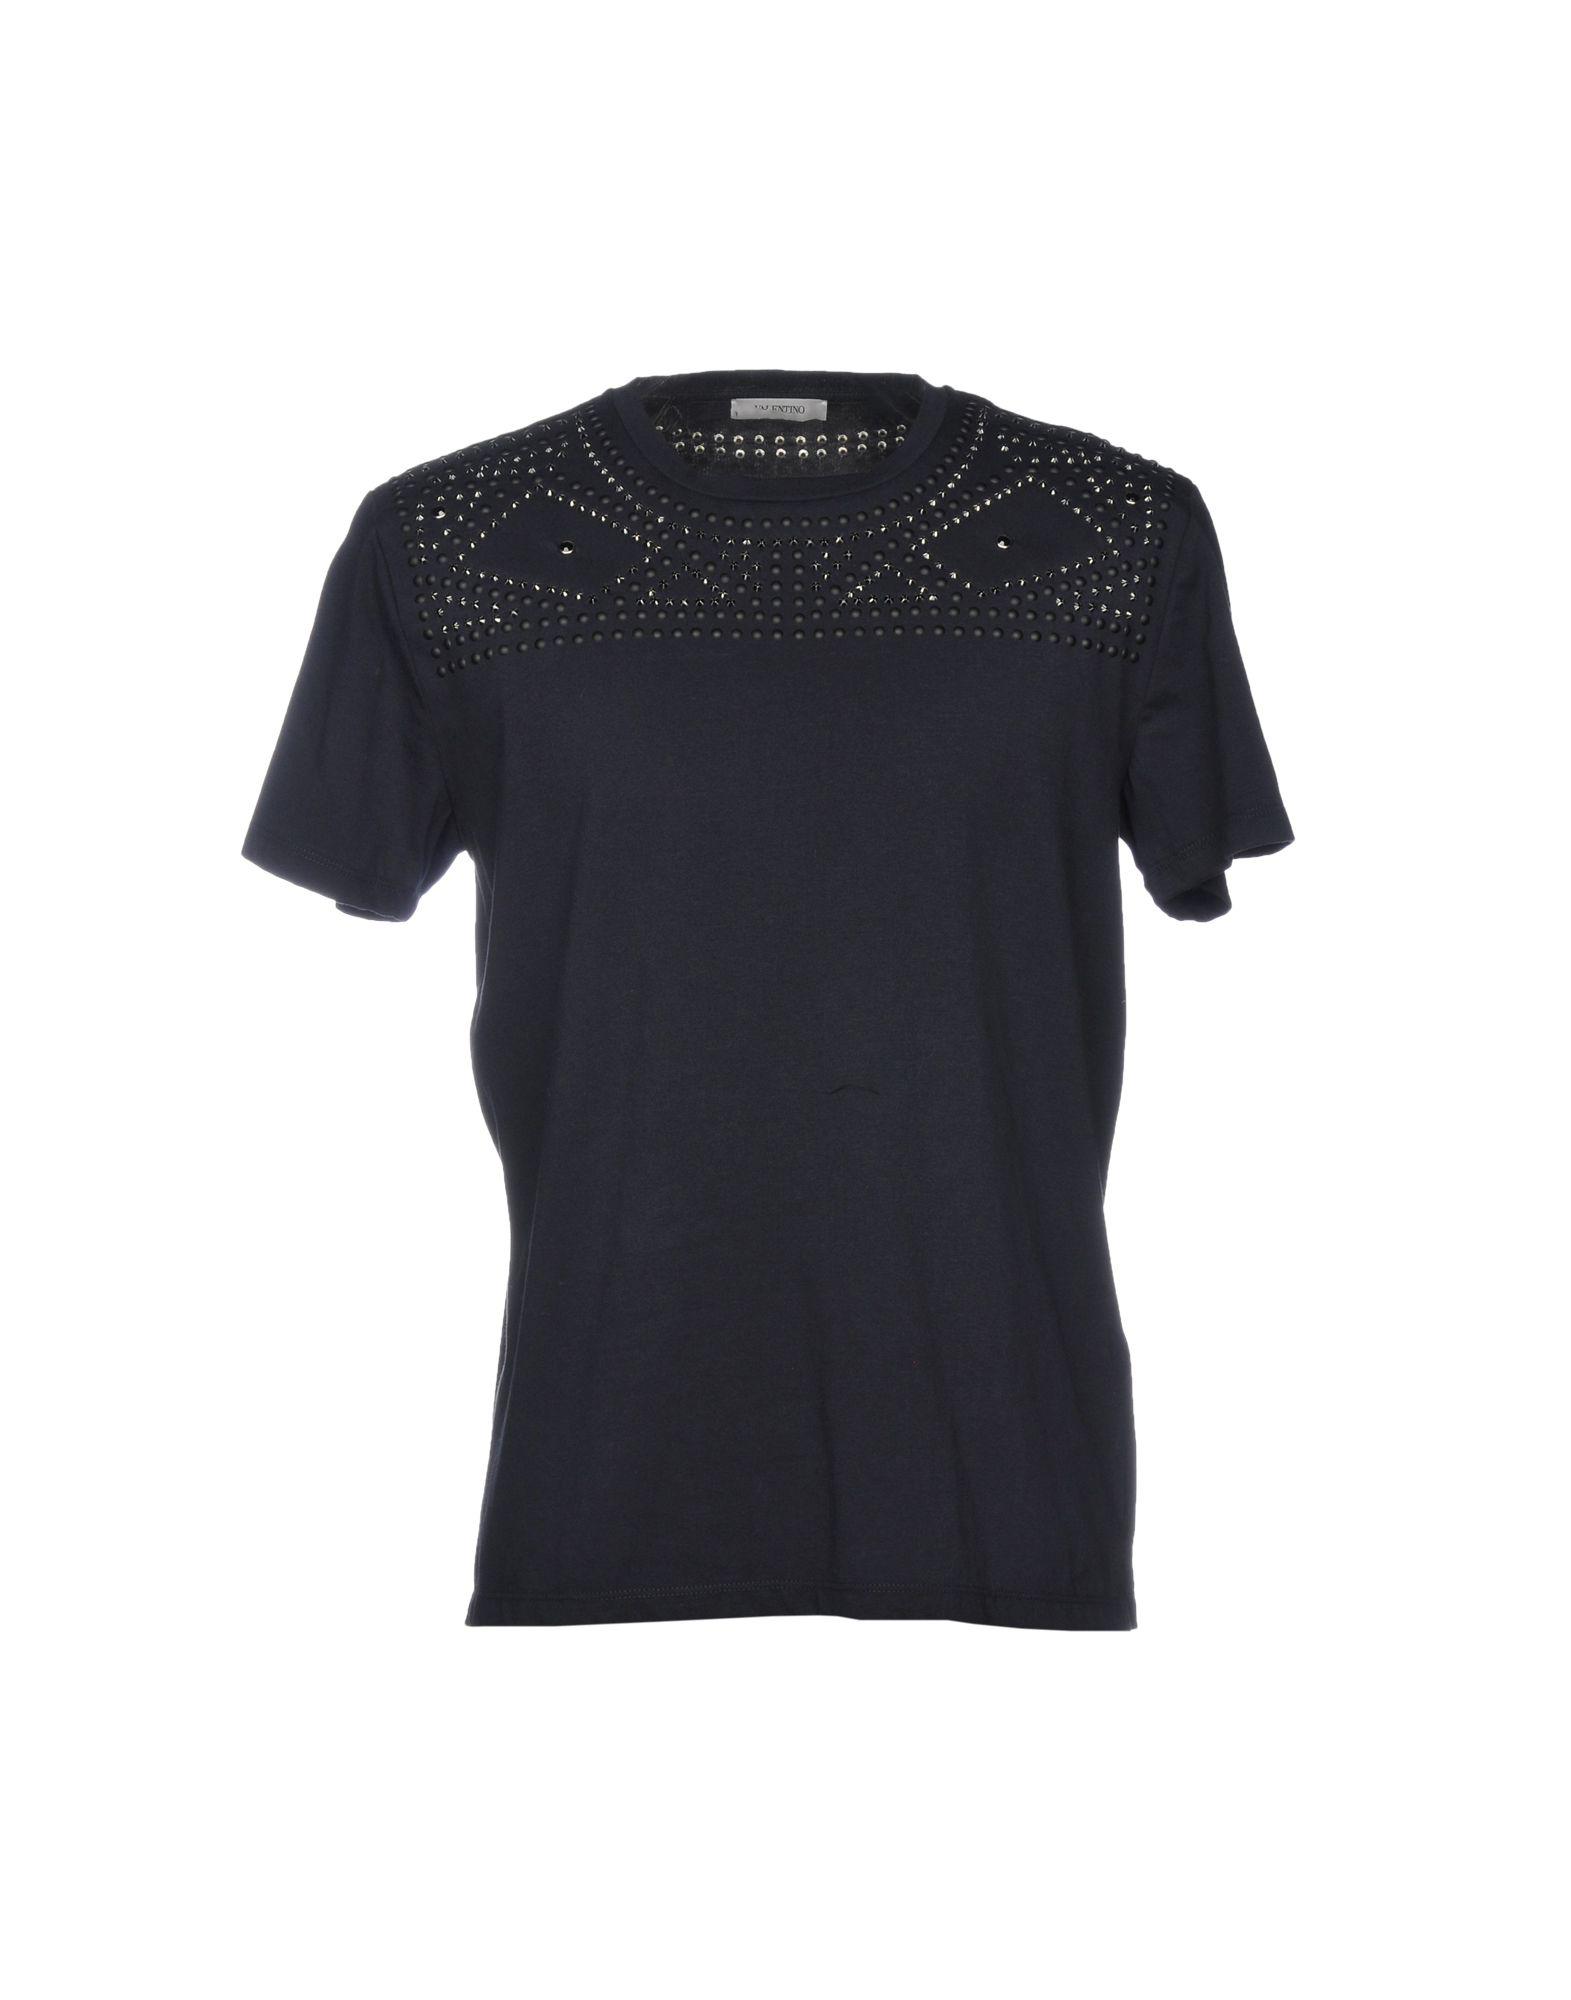 A buon mercato mercato mercato A buon mercato T-Shirt Valentino Uomo - 12185352SS 8ae78d